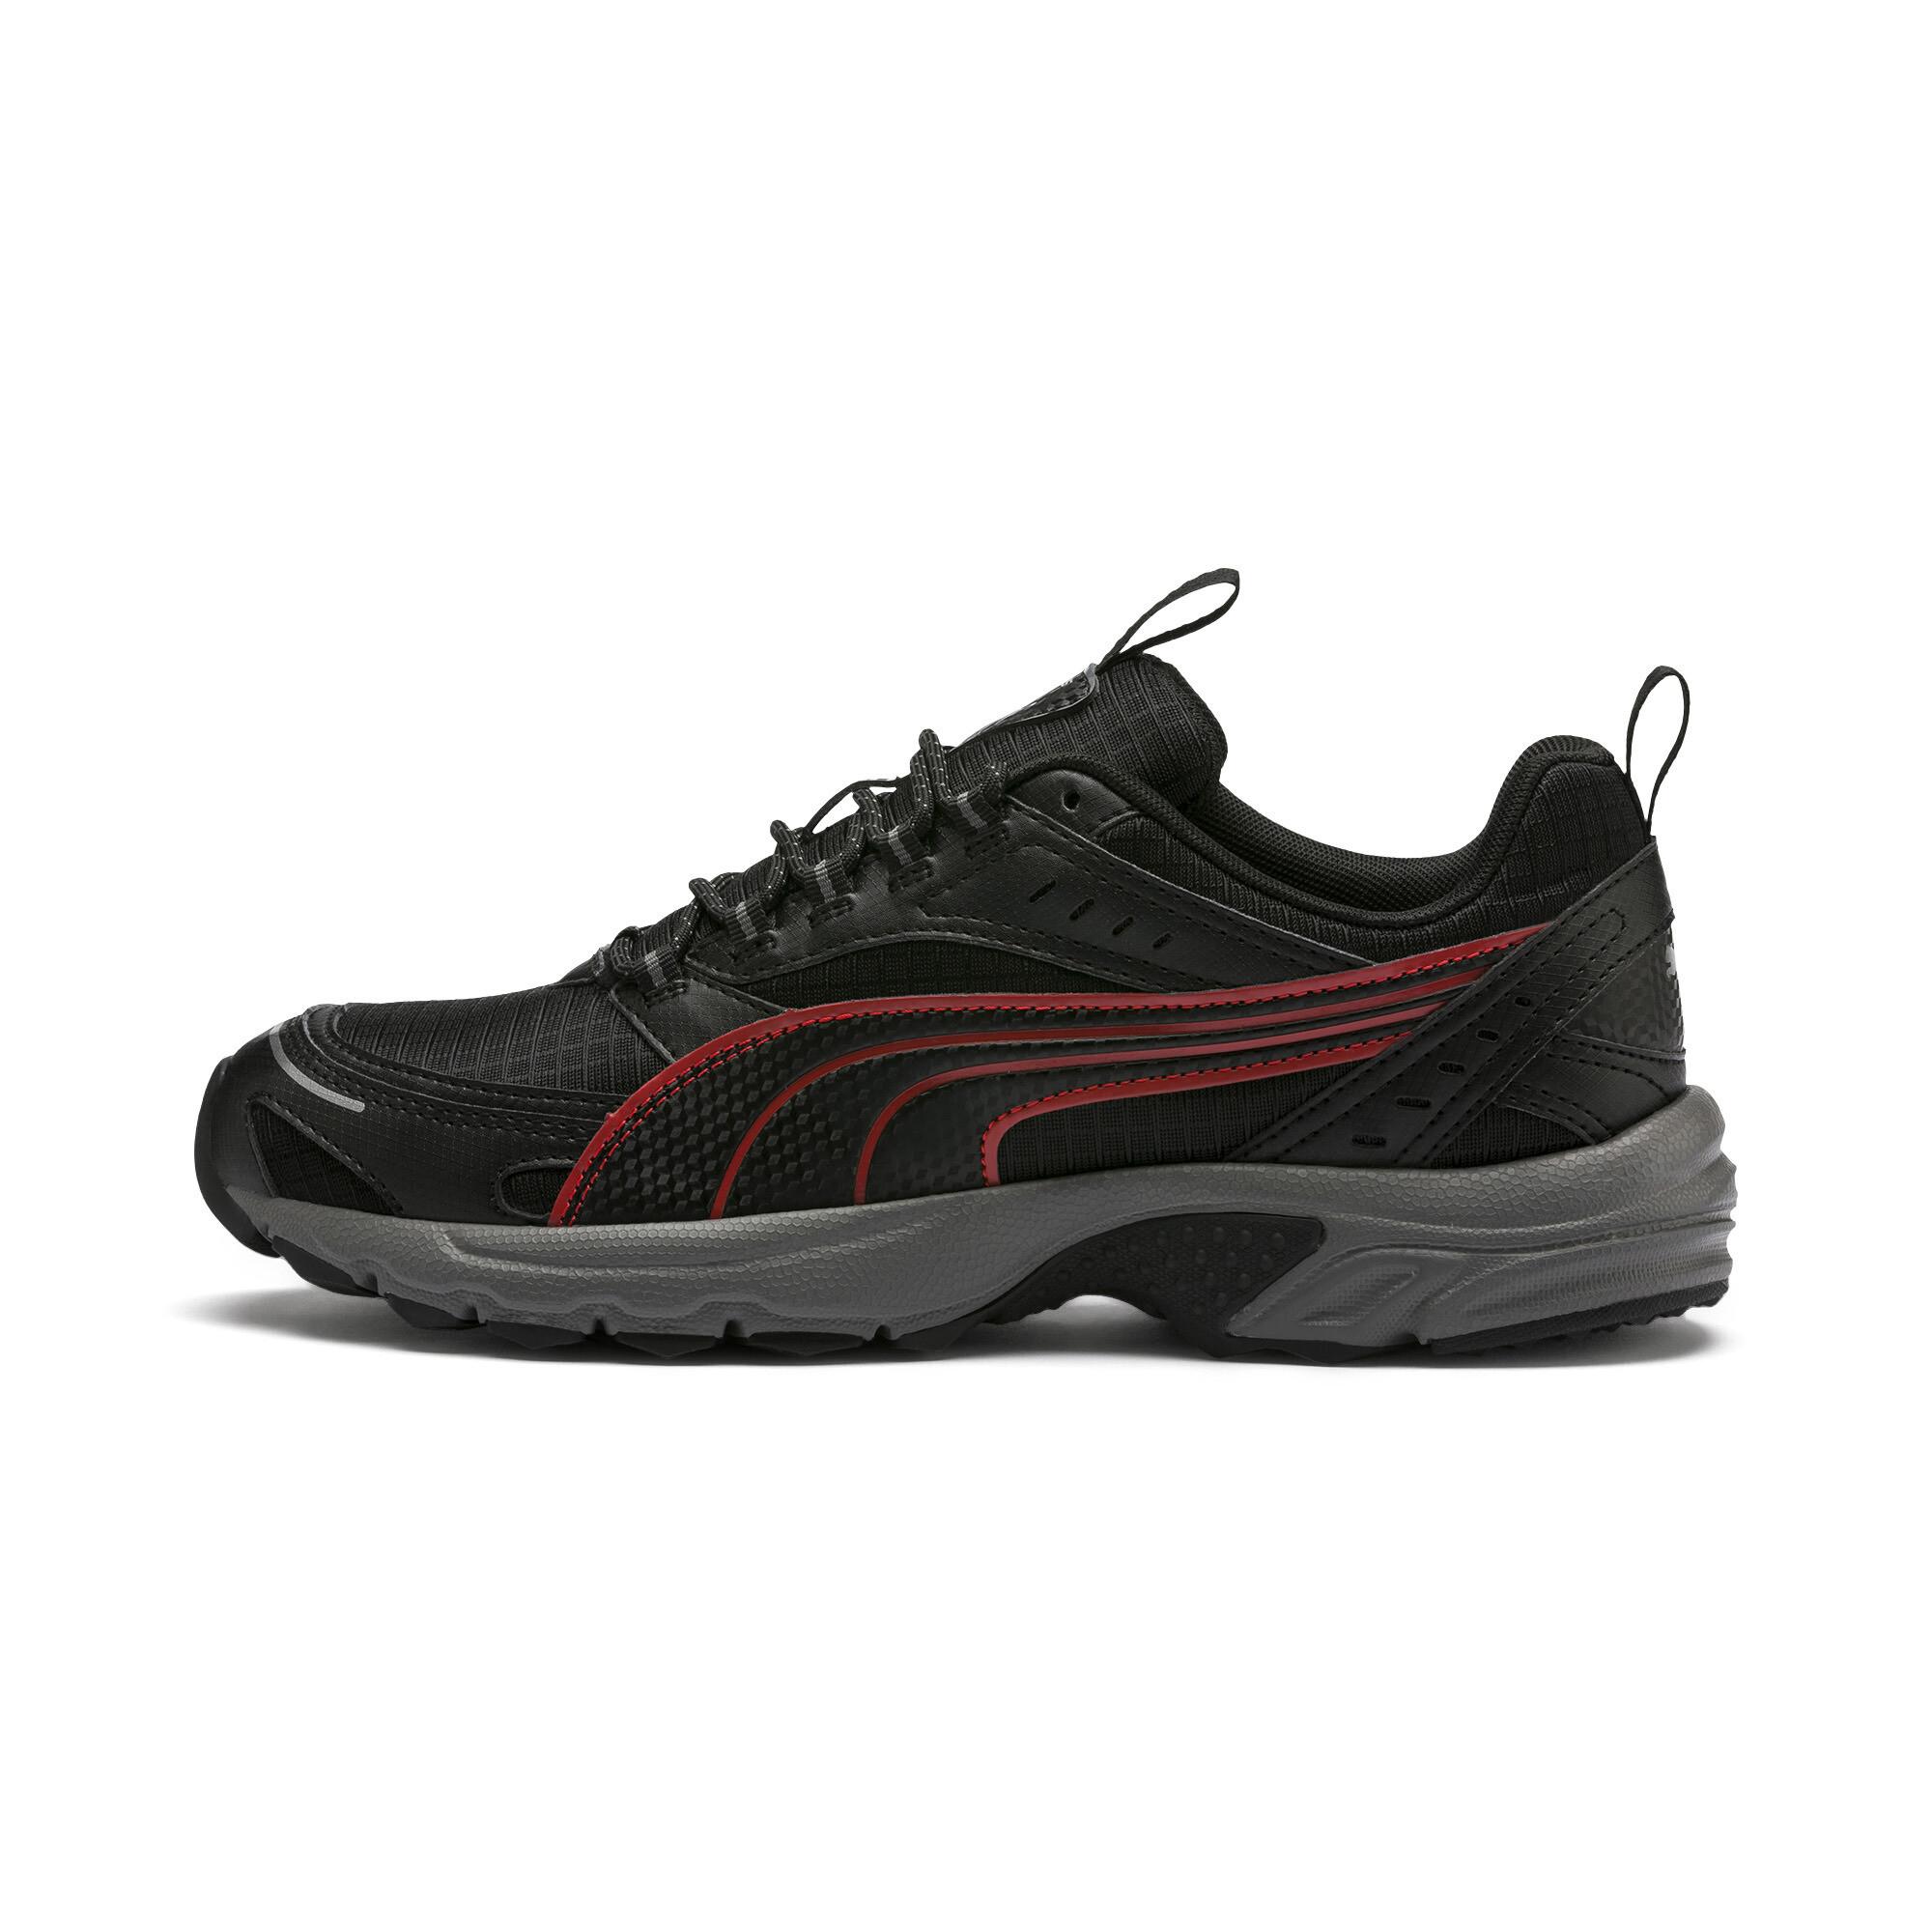 PUMA-Axis-Trail-Sneakers-Men-Shoe-Basics miniature 11